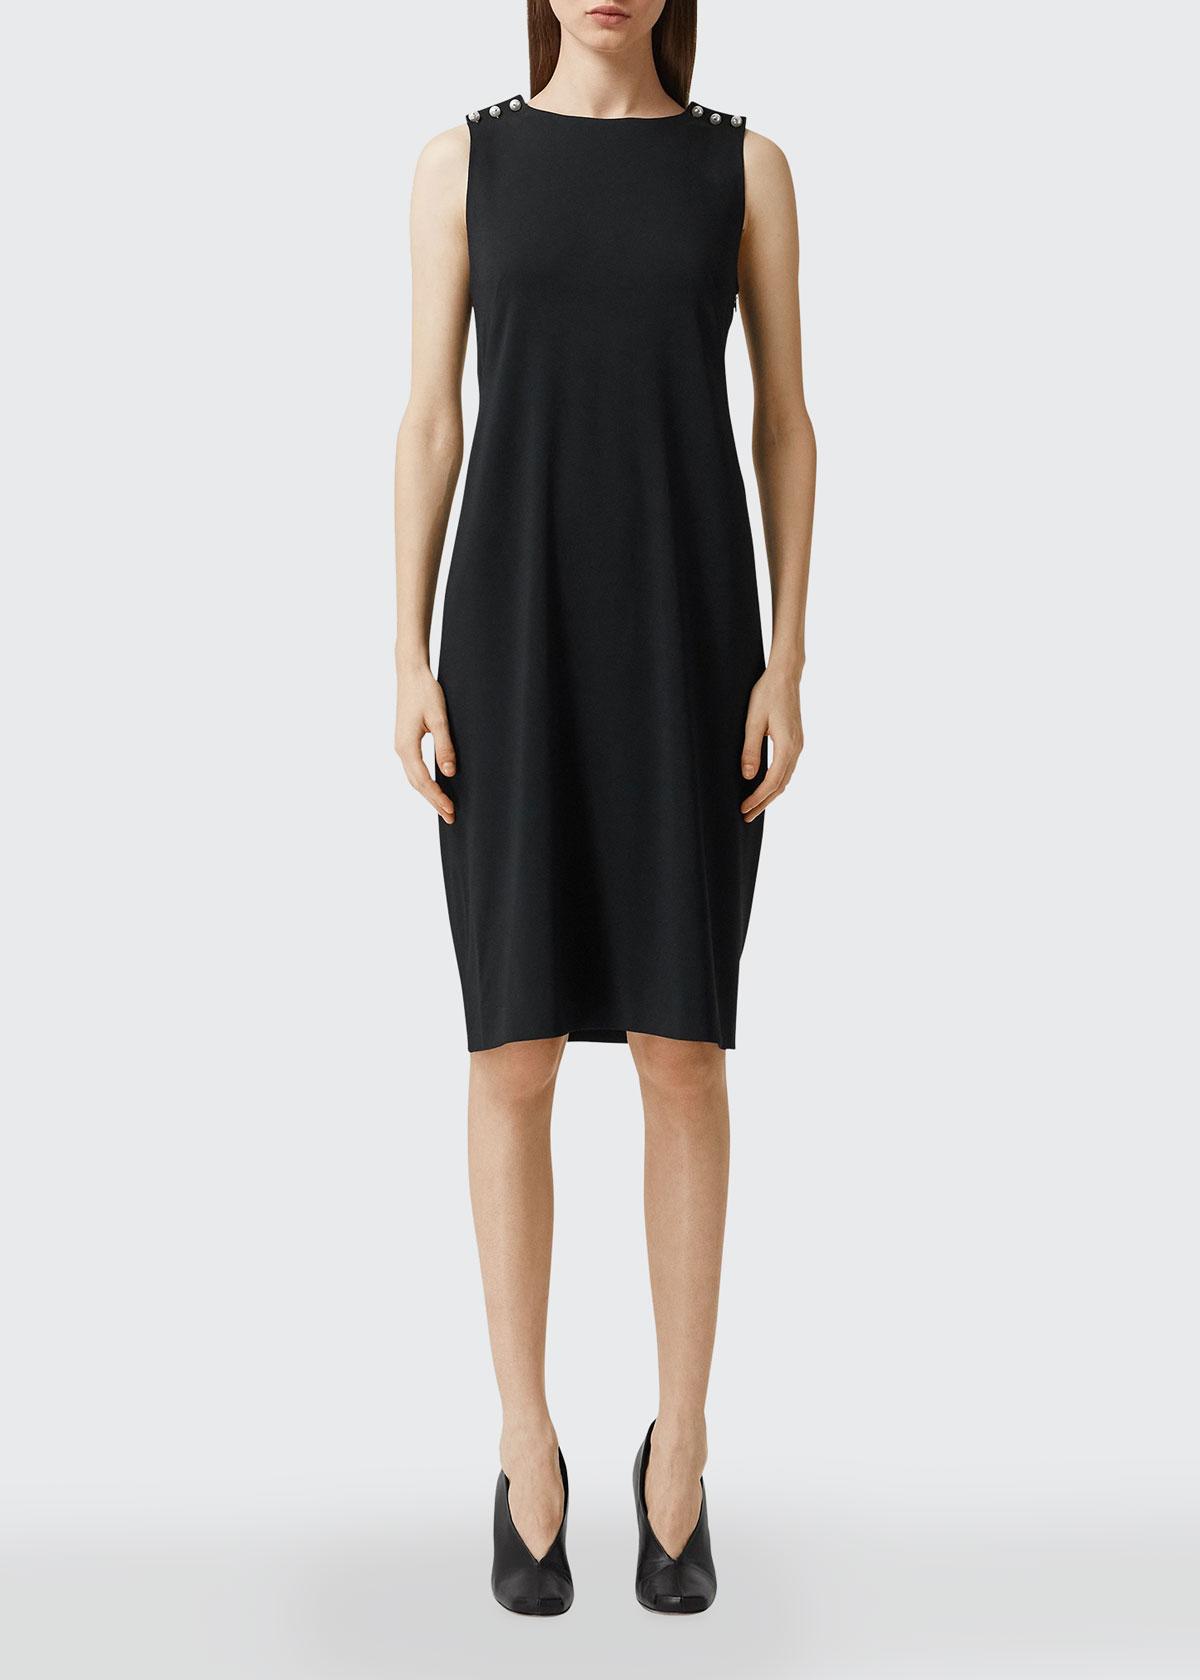 Burberry PEARL CRISSCROSS BACK SHIFT DRESS